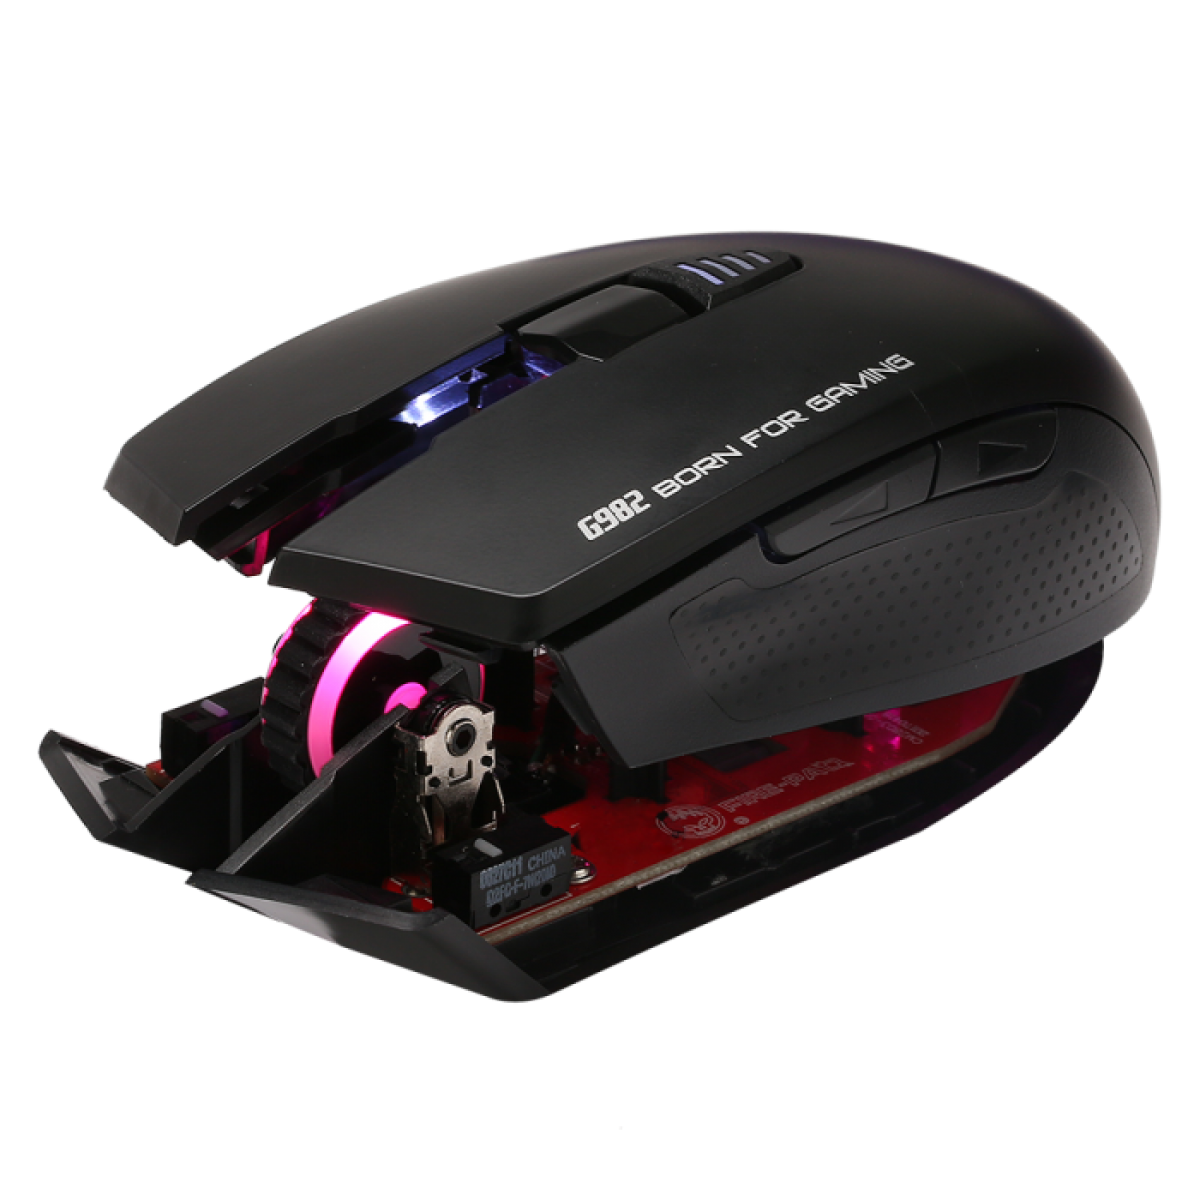 Mouse Marvo Gamer G982 Wired, 6 Botões, 5000 DPI, LED RGB 7 Cores